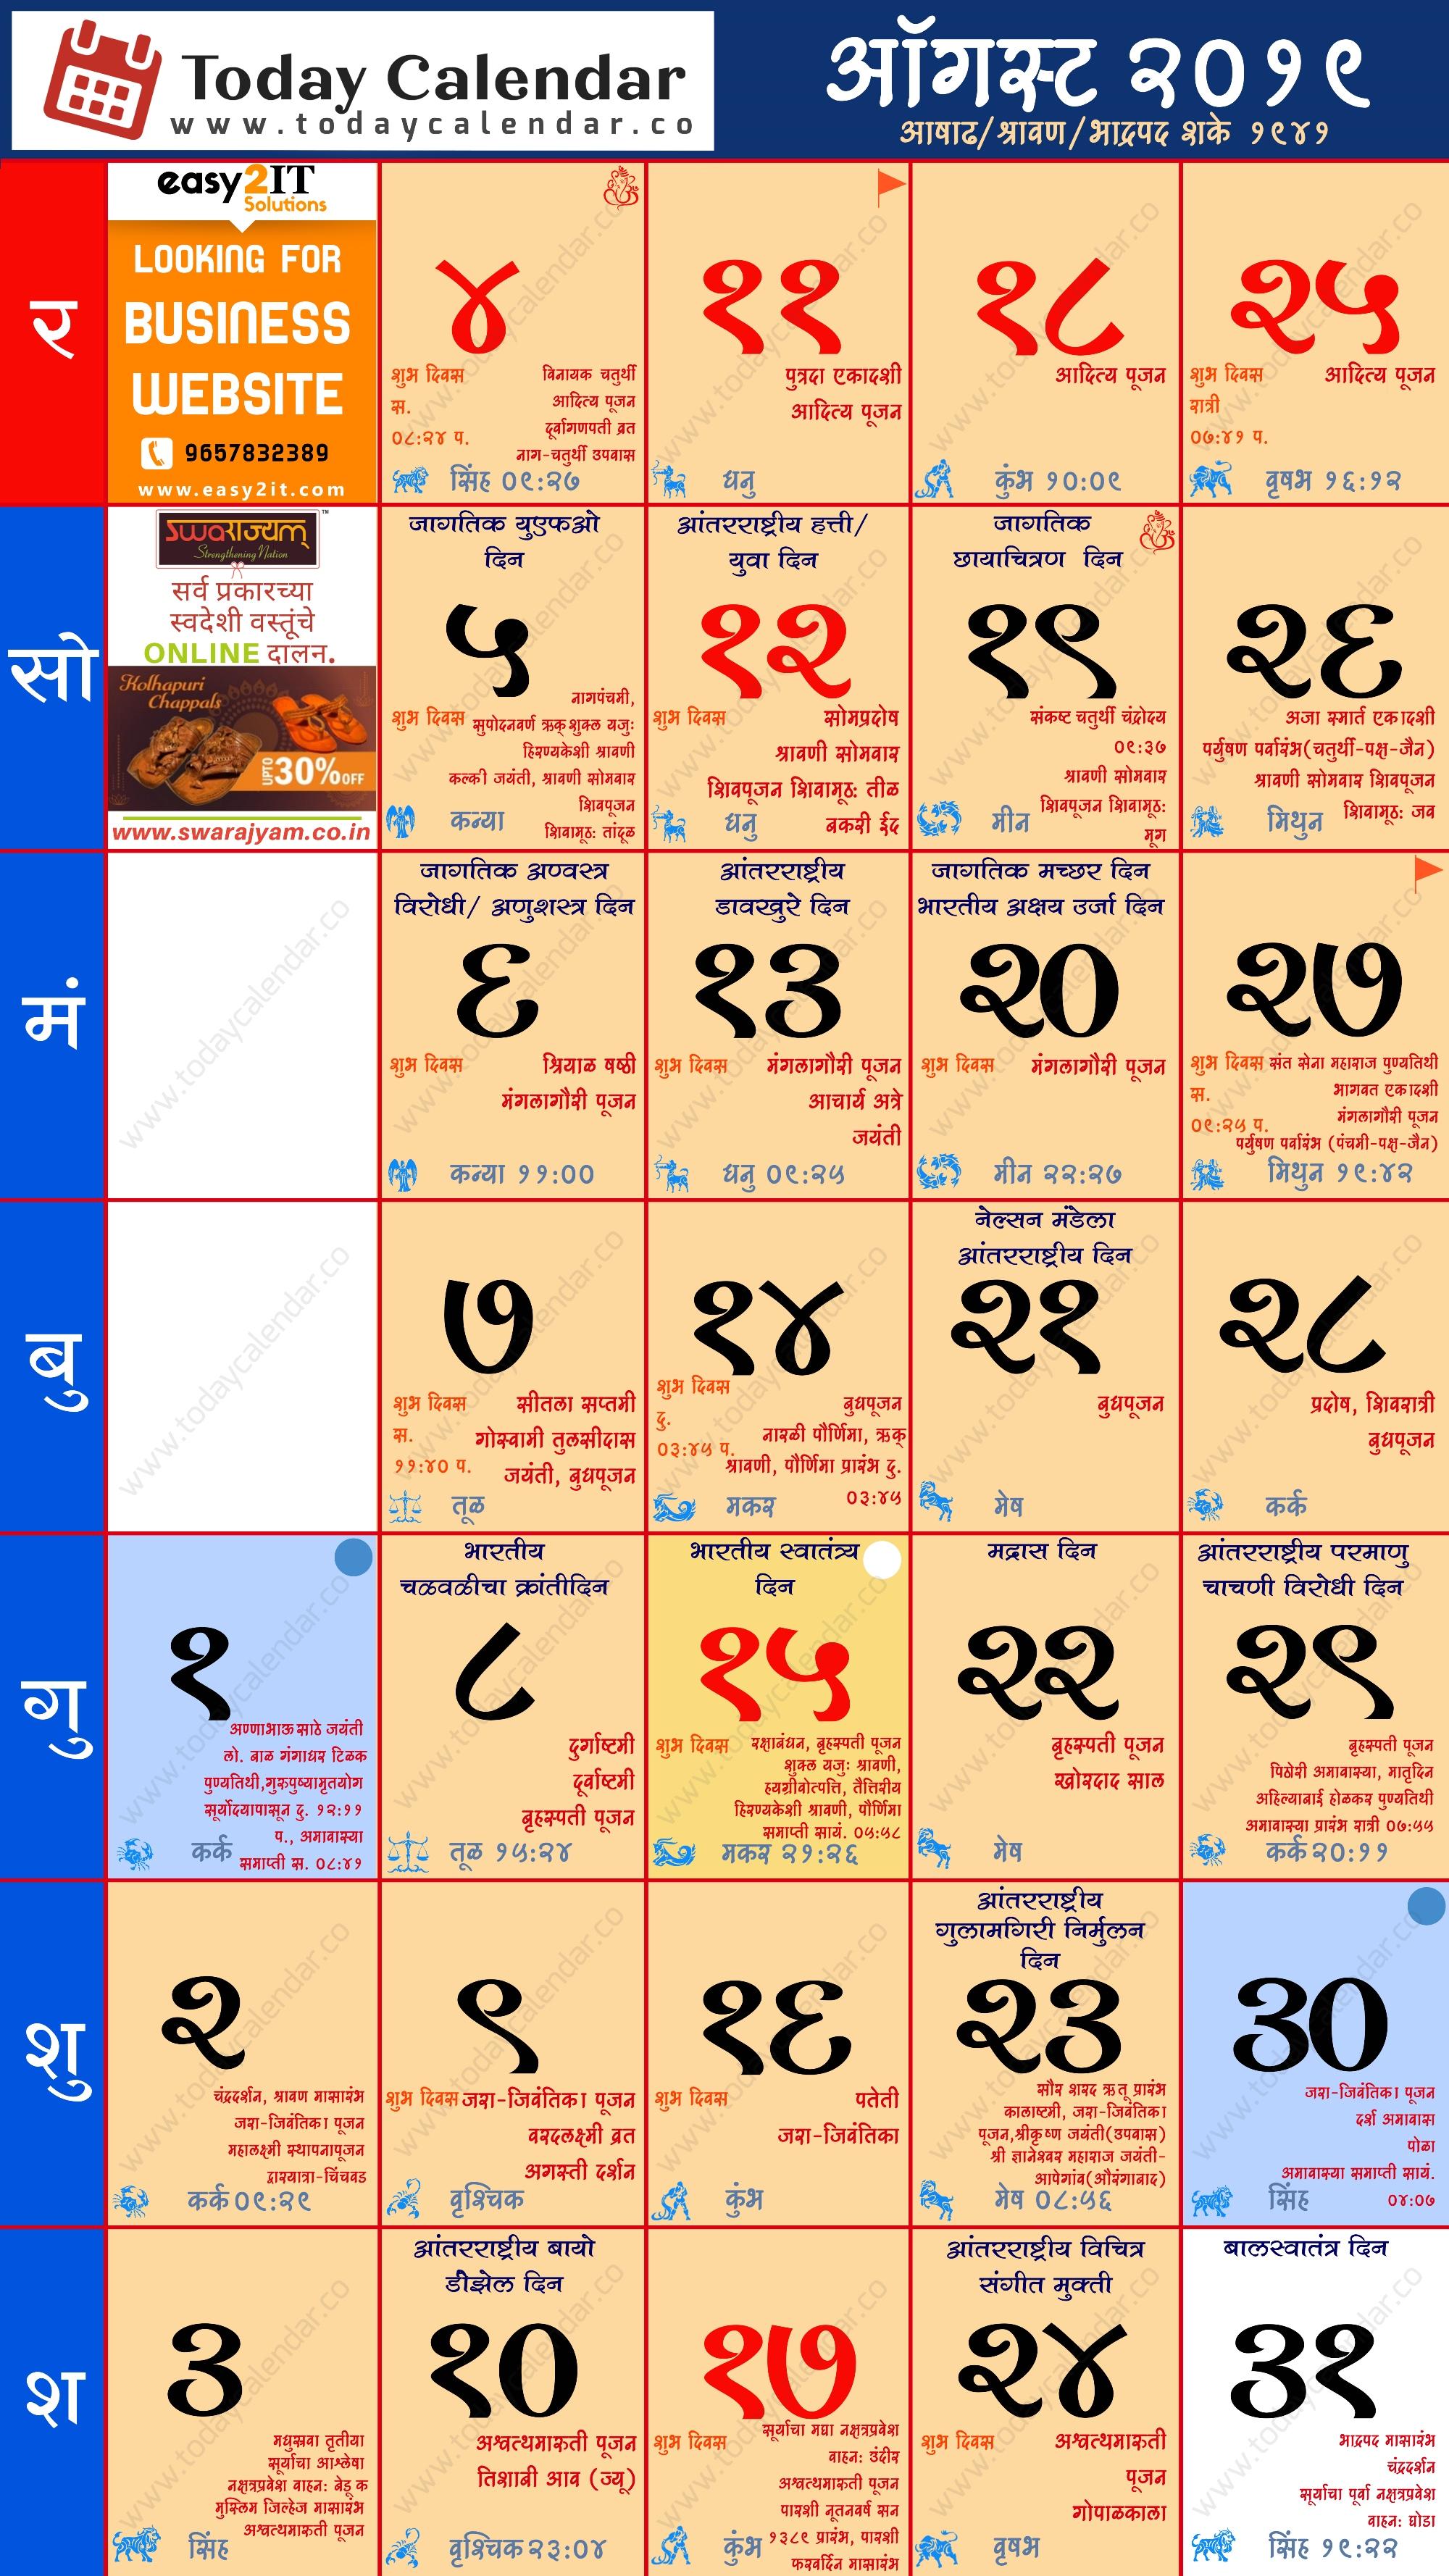 August marathi calendar 2019 todaycalendar